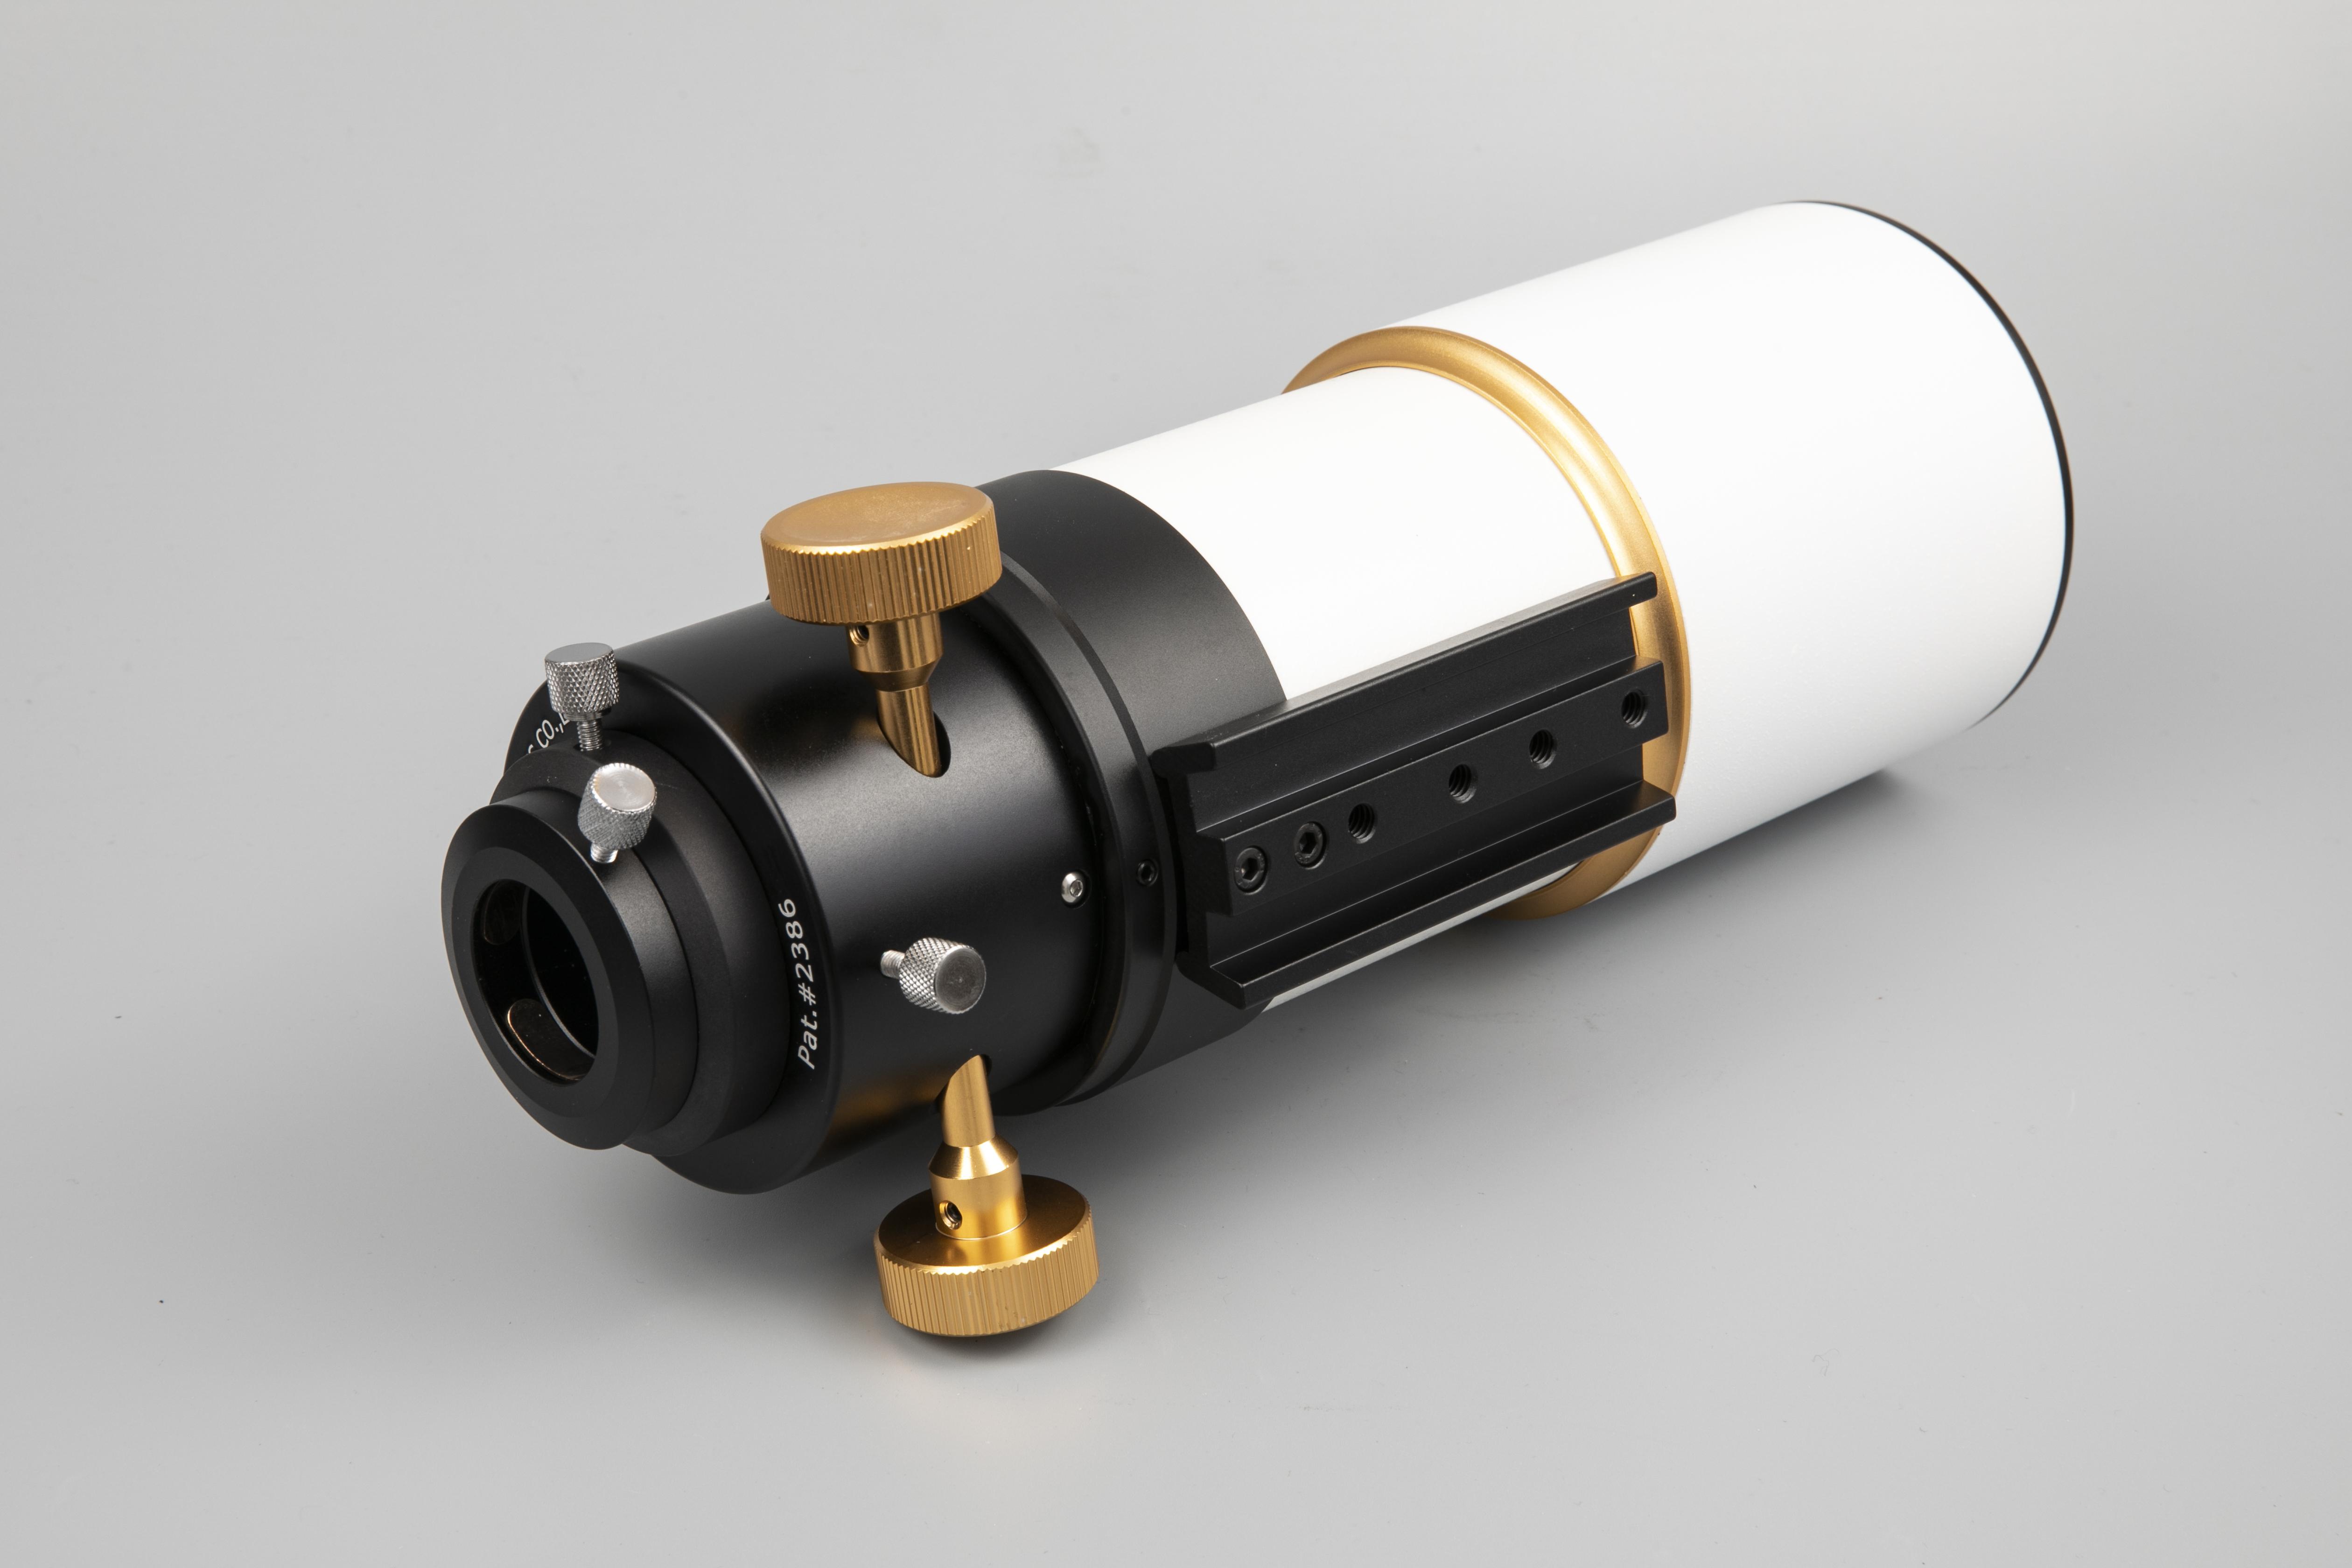 How to avoid shaking the hand-held telescope